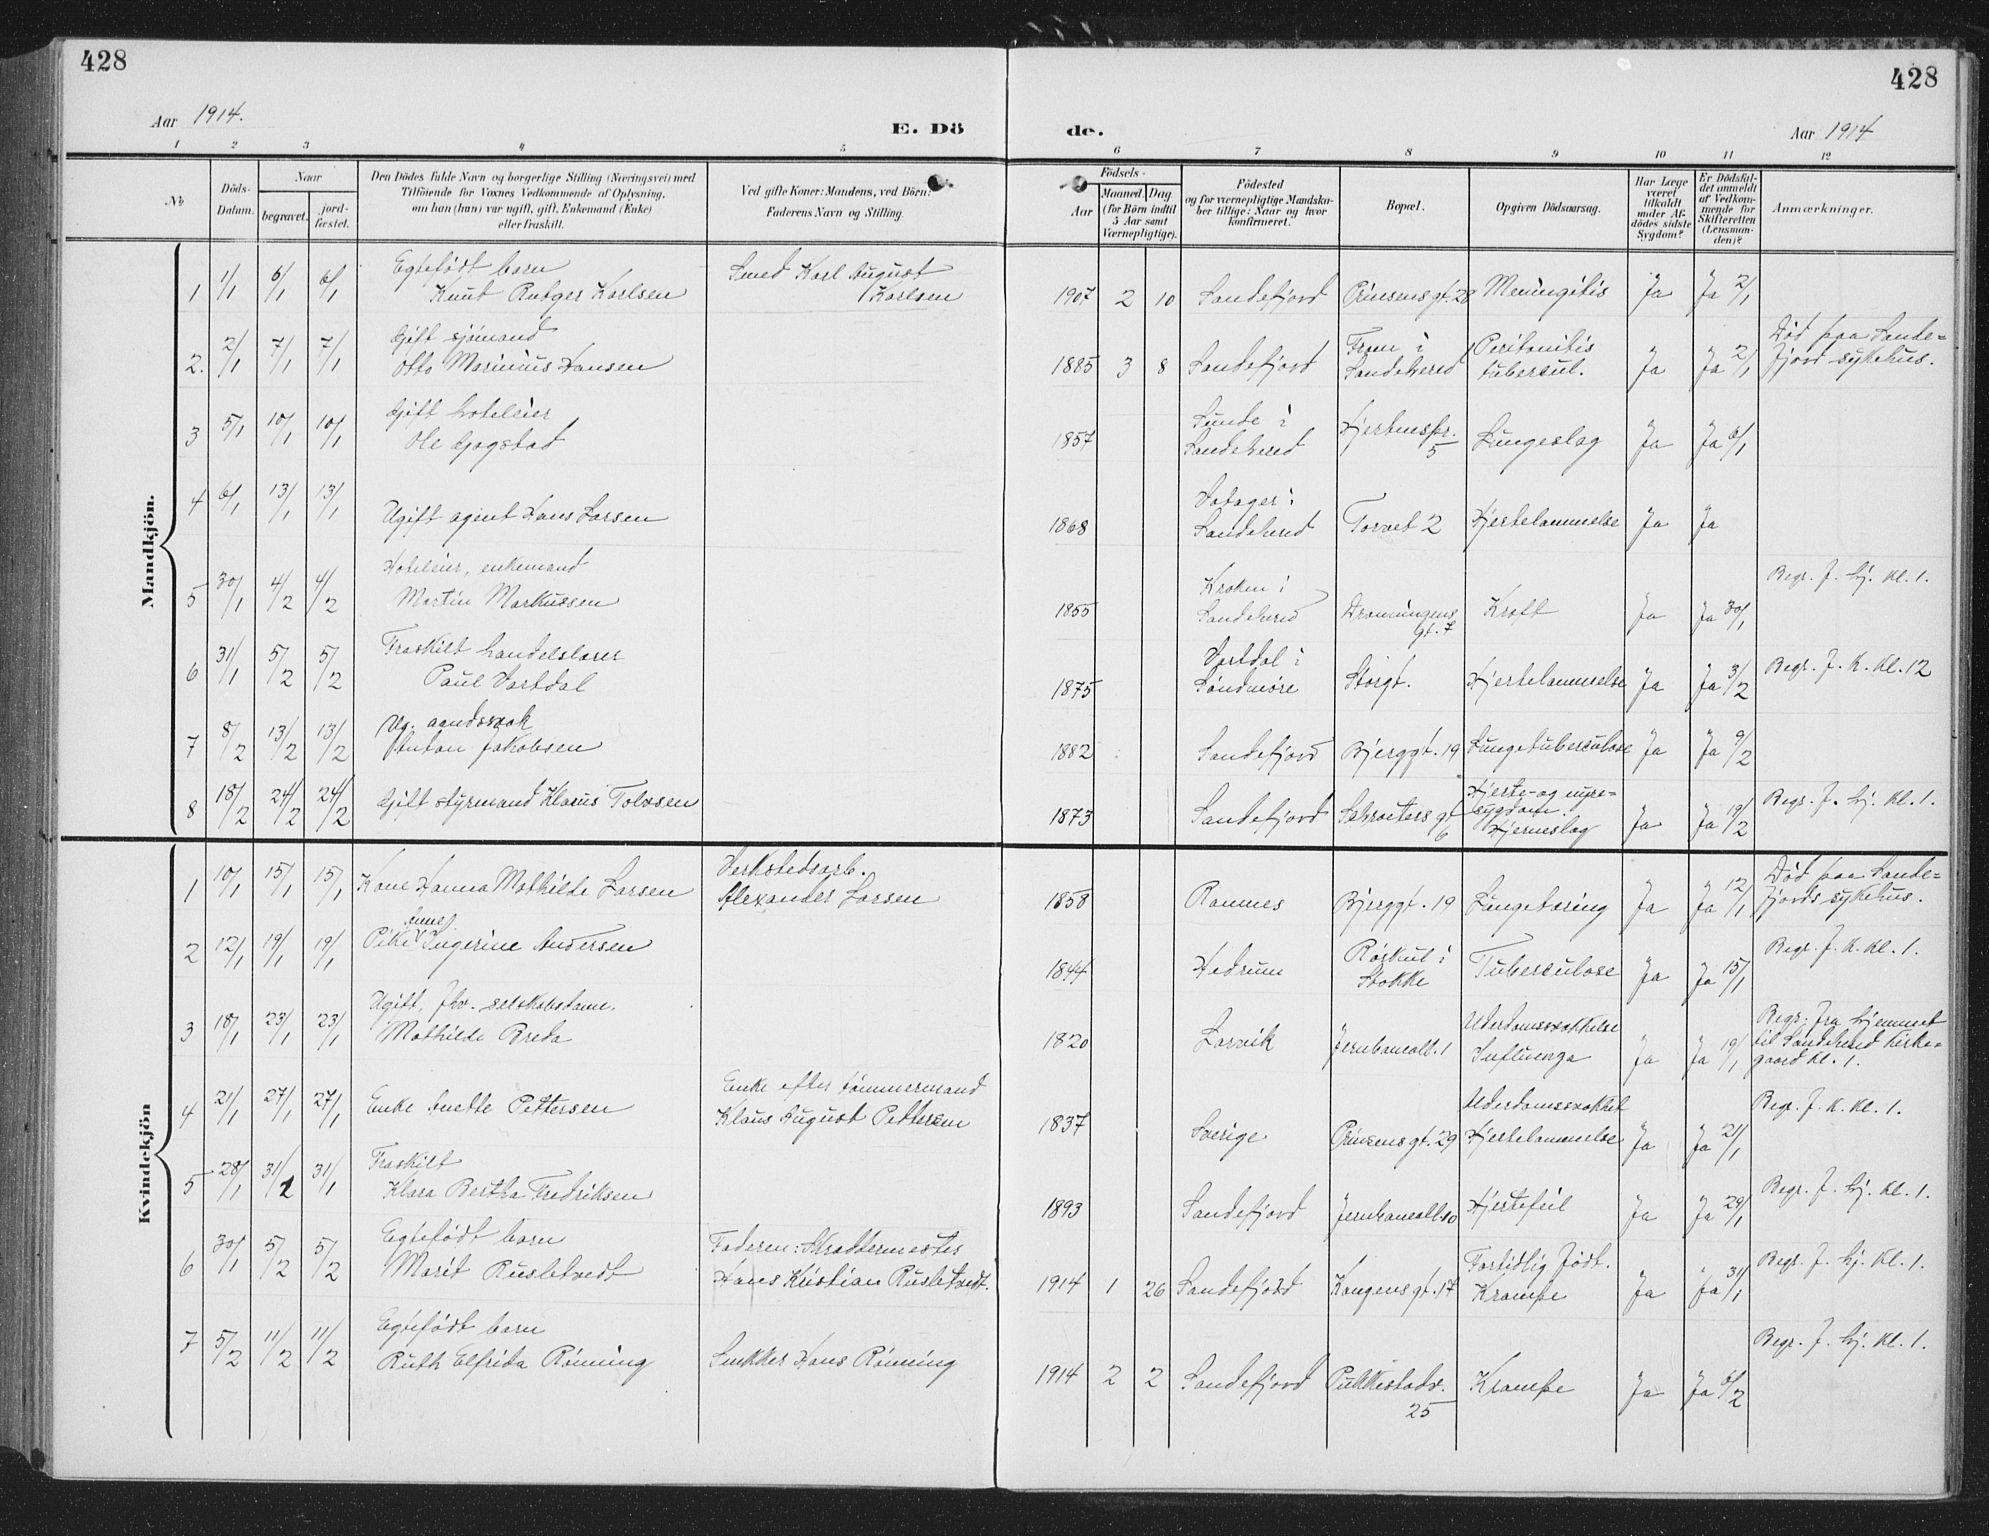 SAKO, Sandefjord kirkebøker, G/Ga/L0003: Klokkerbok nr. 3, 1903-1920, s. 428